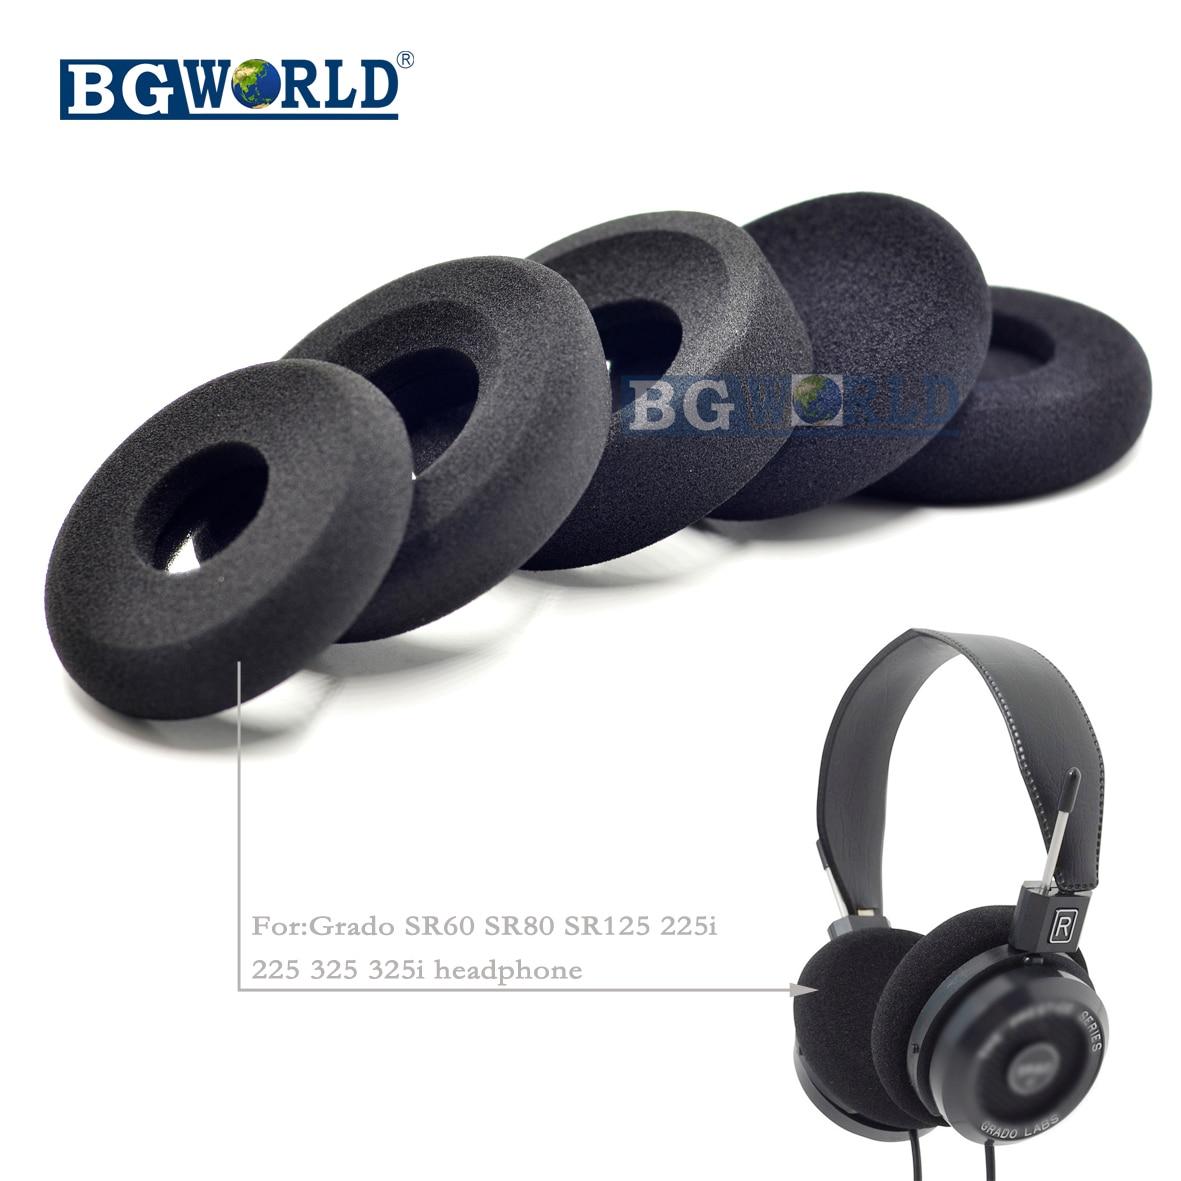 Bgworld Upgrade Replacement Ear Pads Earpads Foam Cushion Earmuffs Grado Sr125 Wiring Diagram Earpad For Sr60 Sr80 Sr225 325 325i